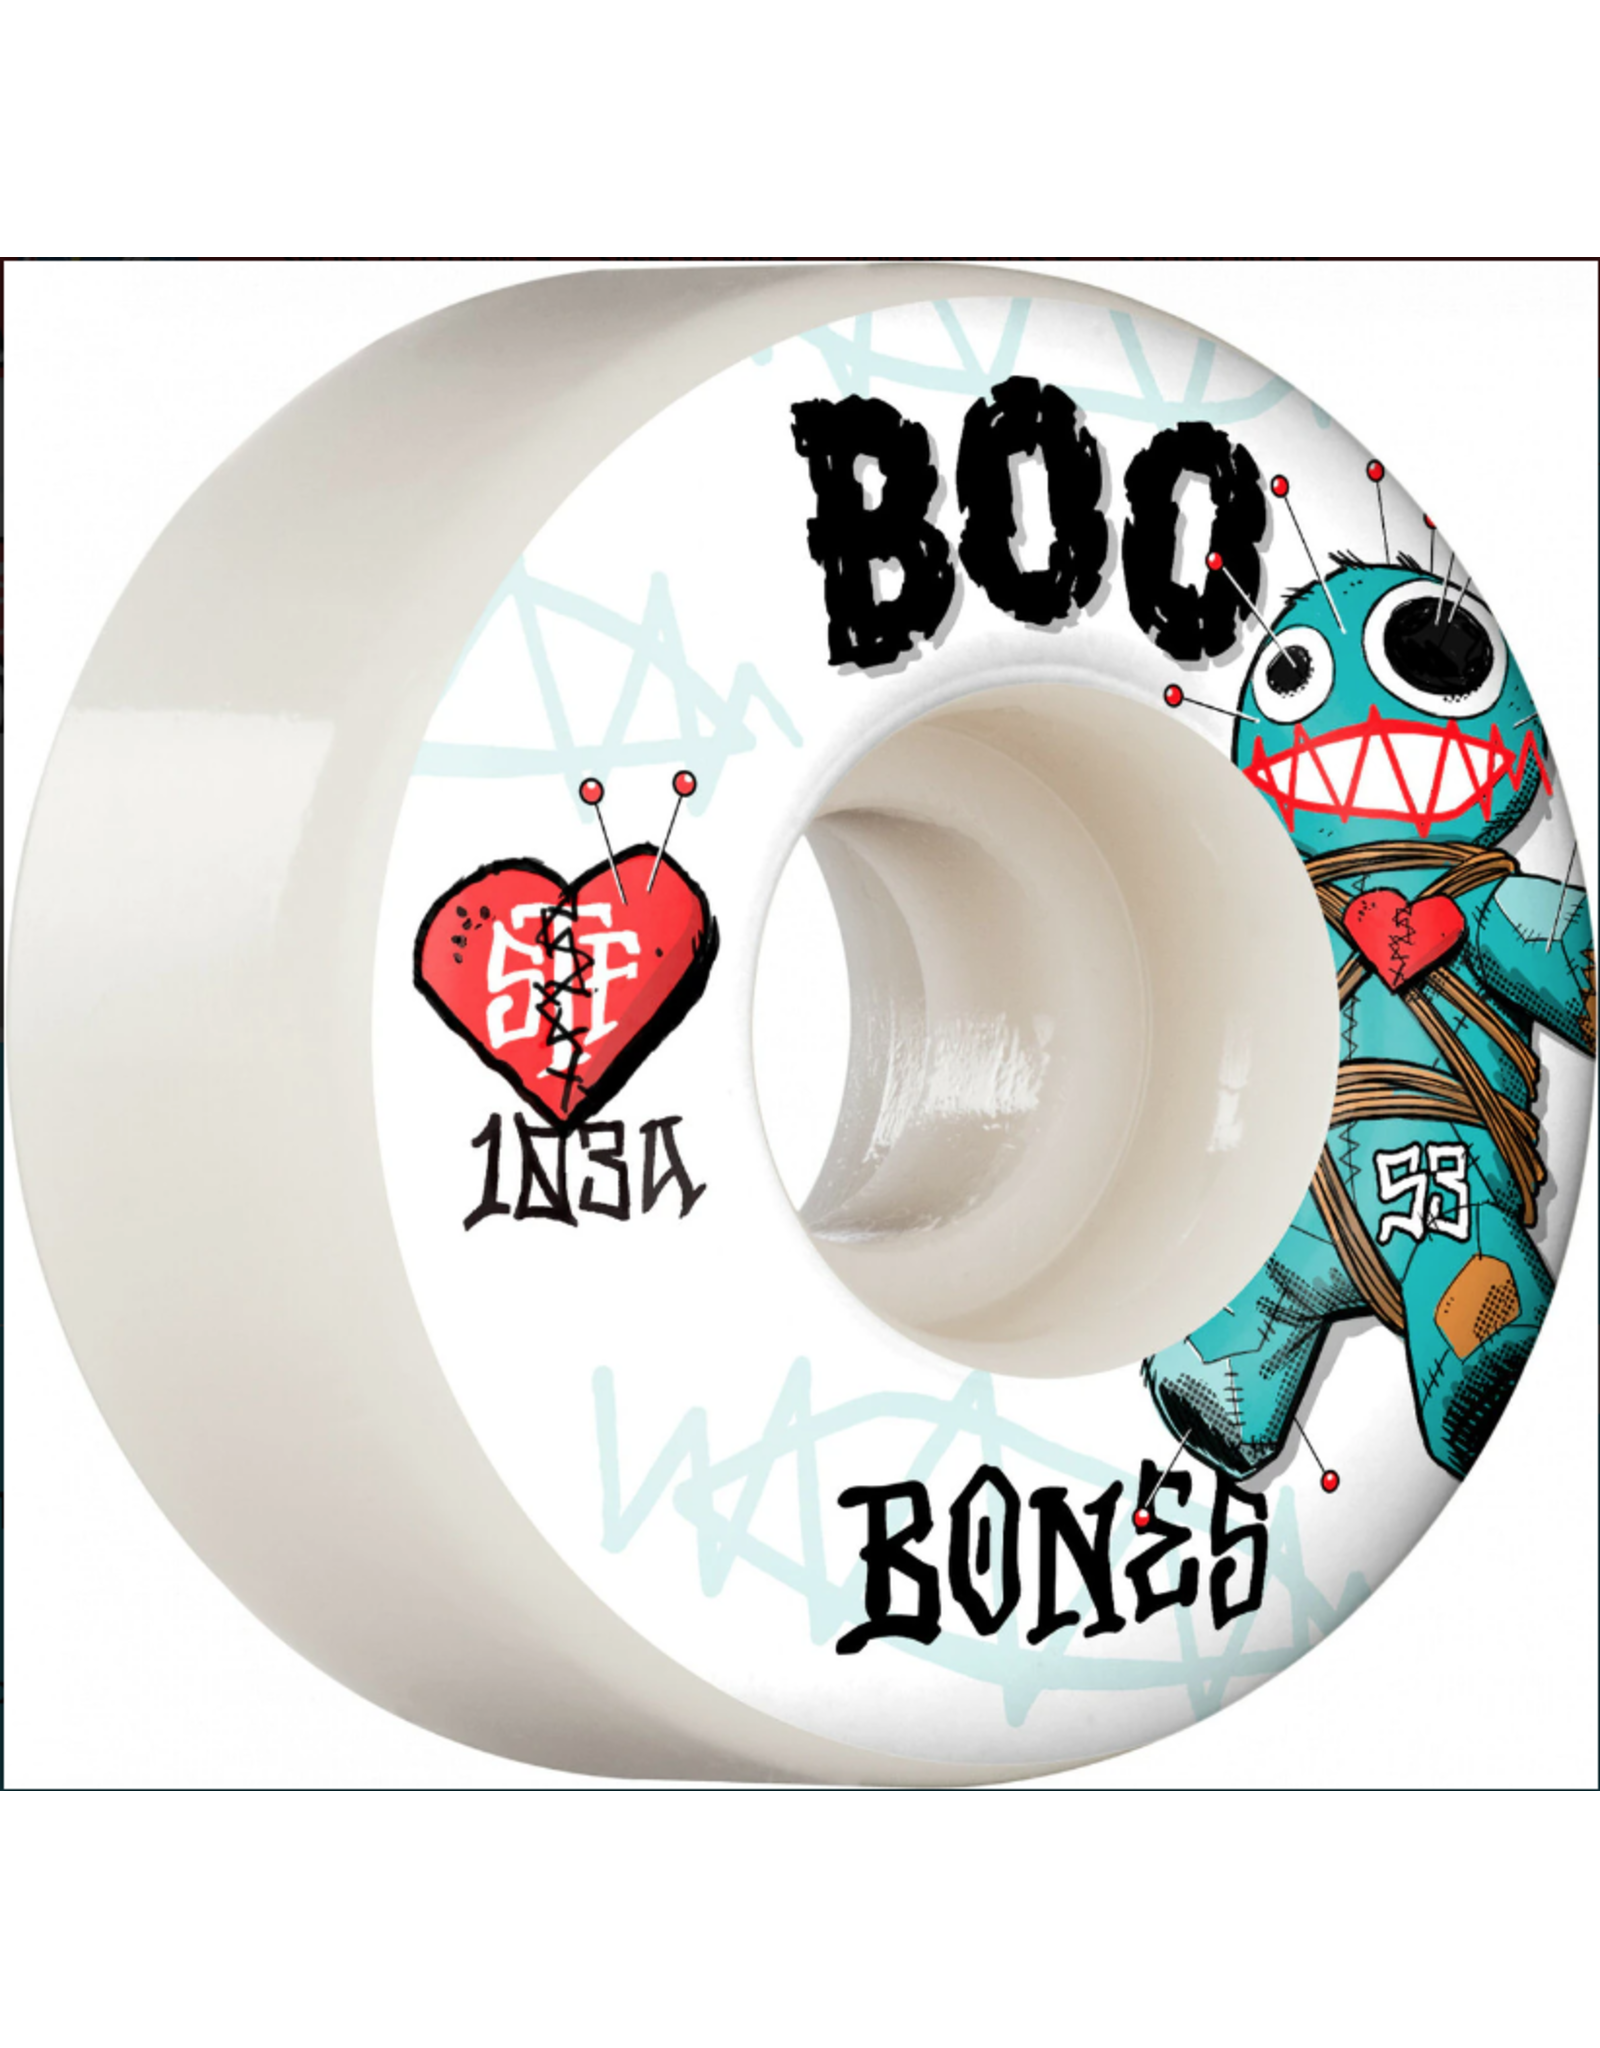 BONES BONES STF 53mm V4 Wide 103A Boo Voodoo Skateboard Wheels 4pk White<br /> Bones Wheels